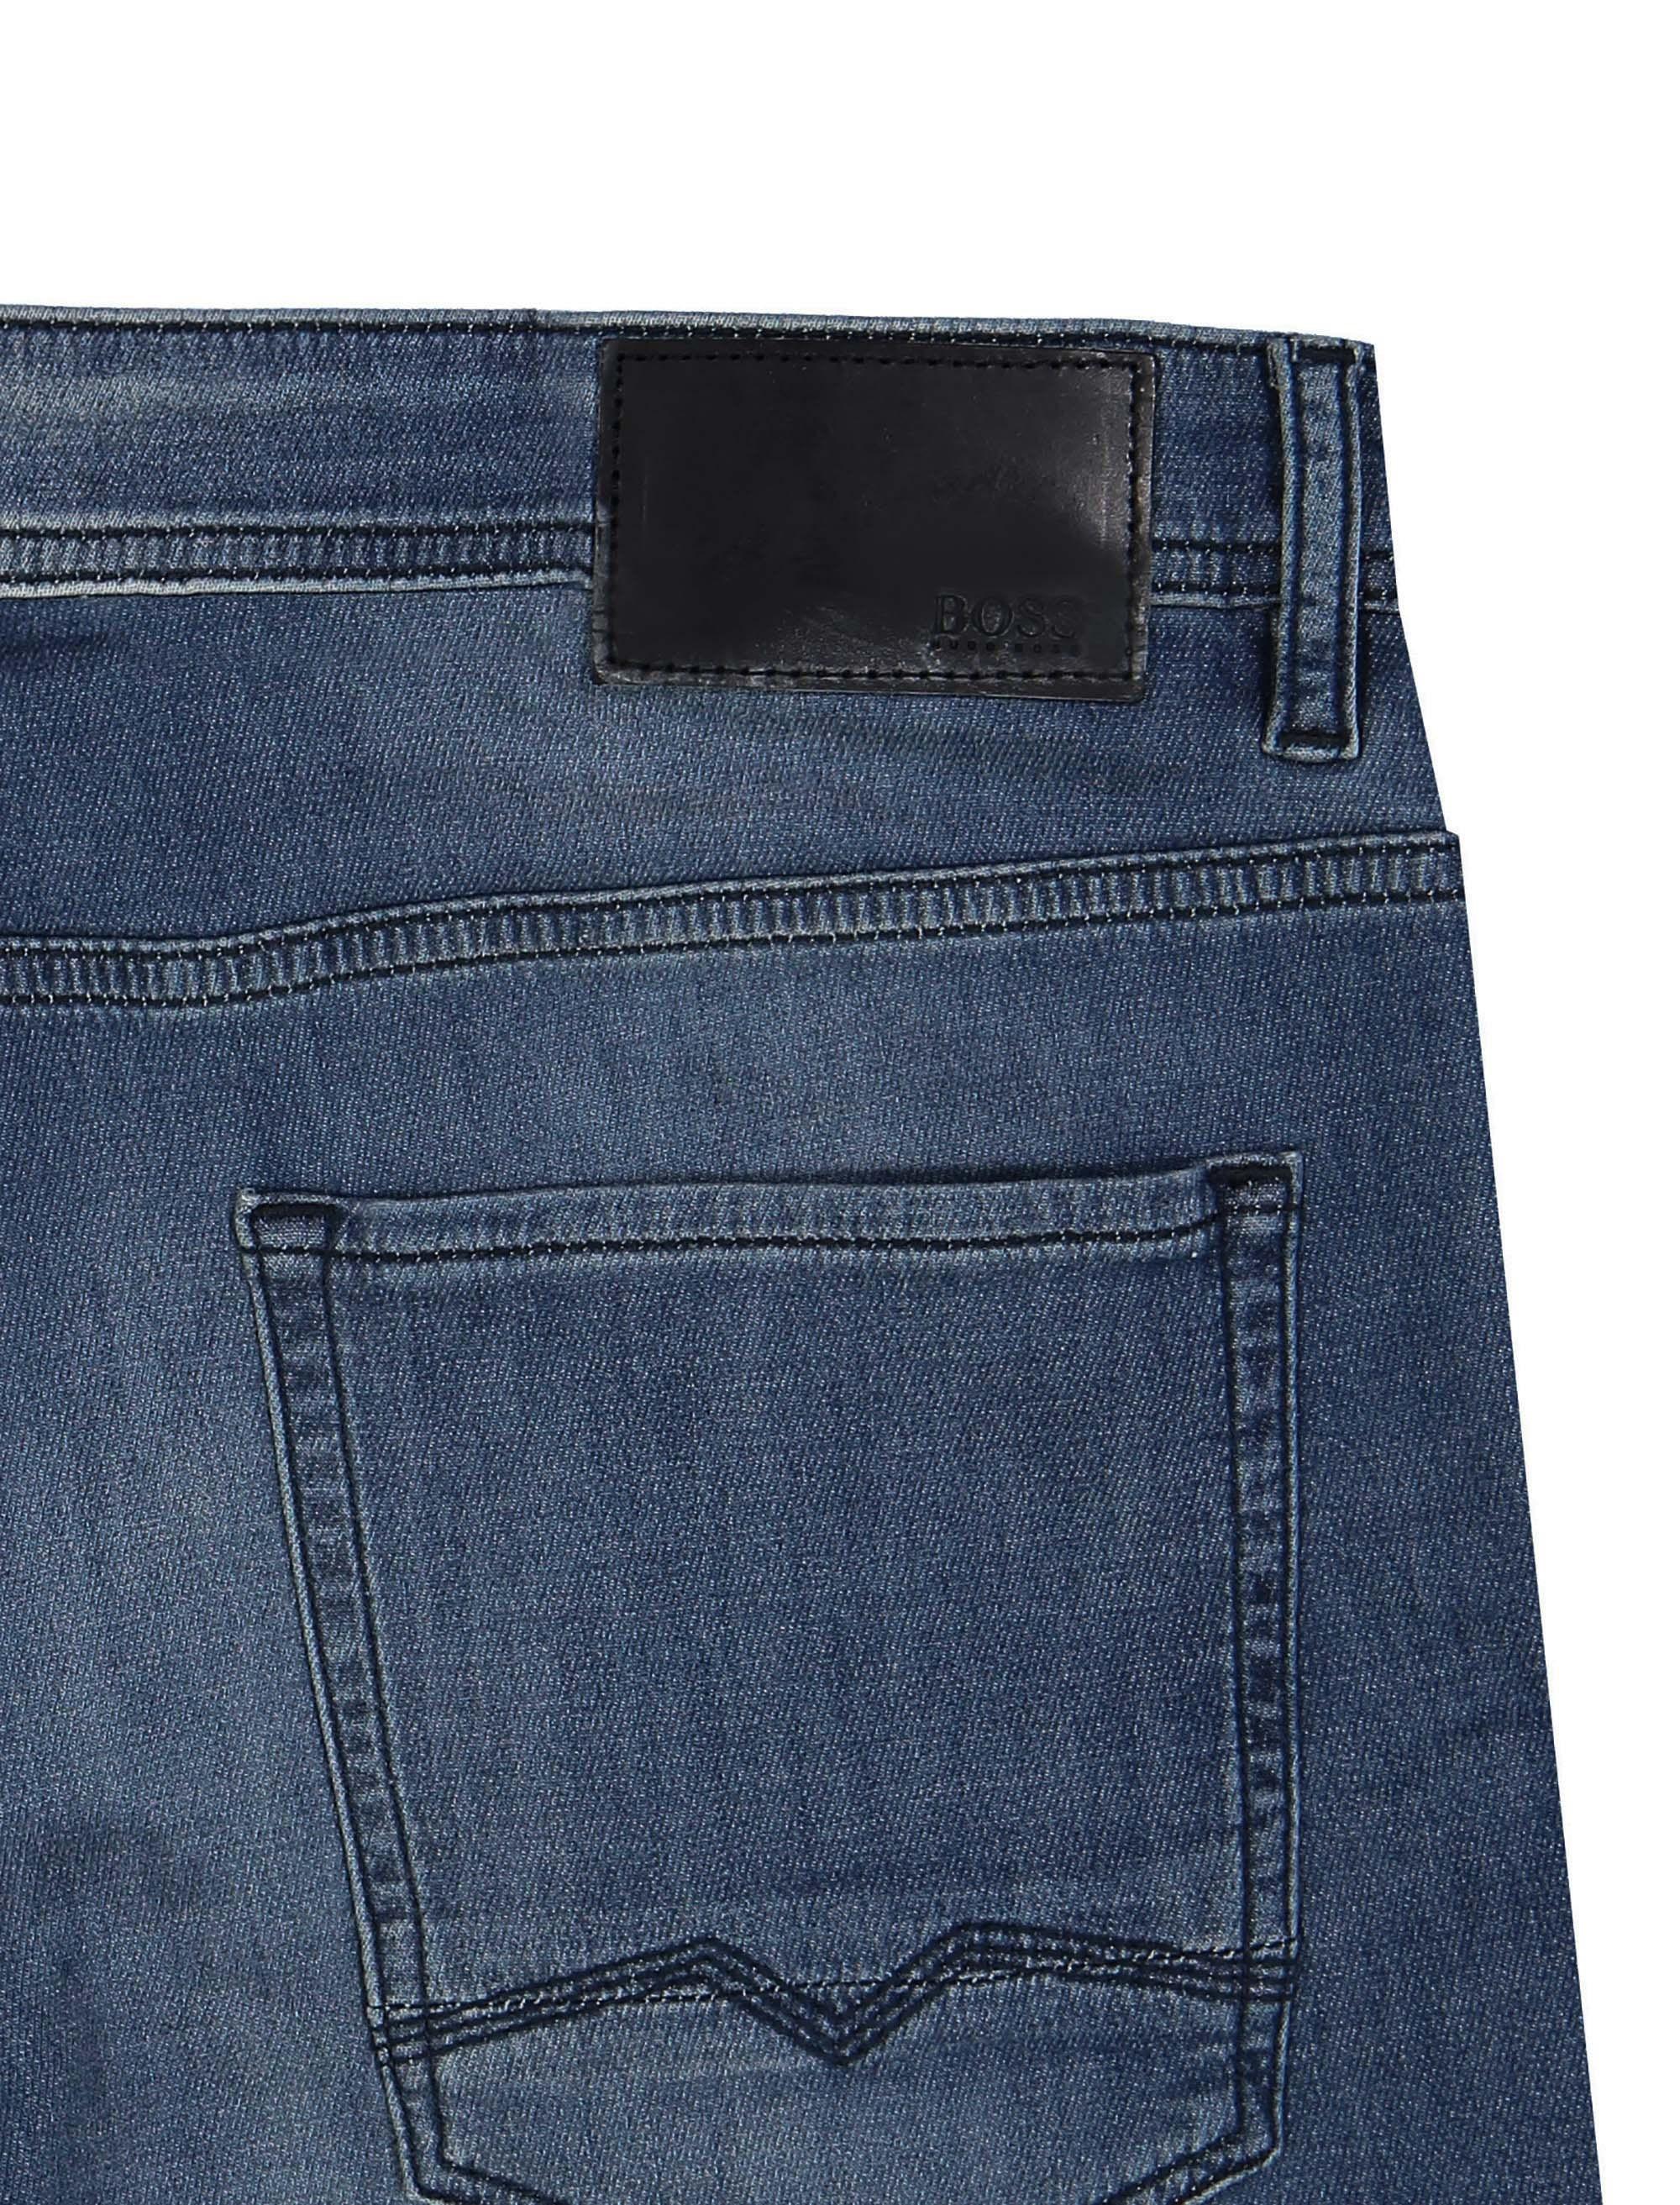 شلوار جین راسته مردانه Orange90-P SUAVE - باس اورنج - آبي تيره - 6